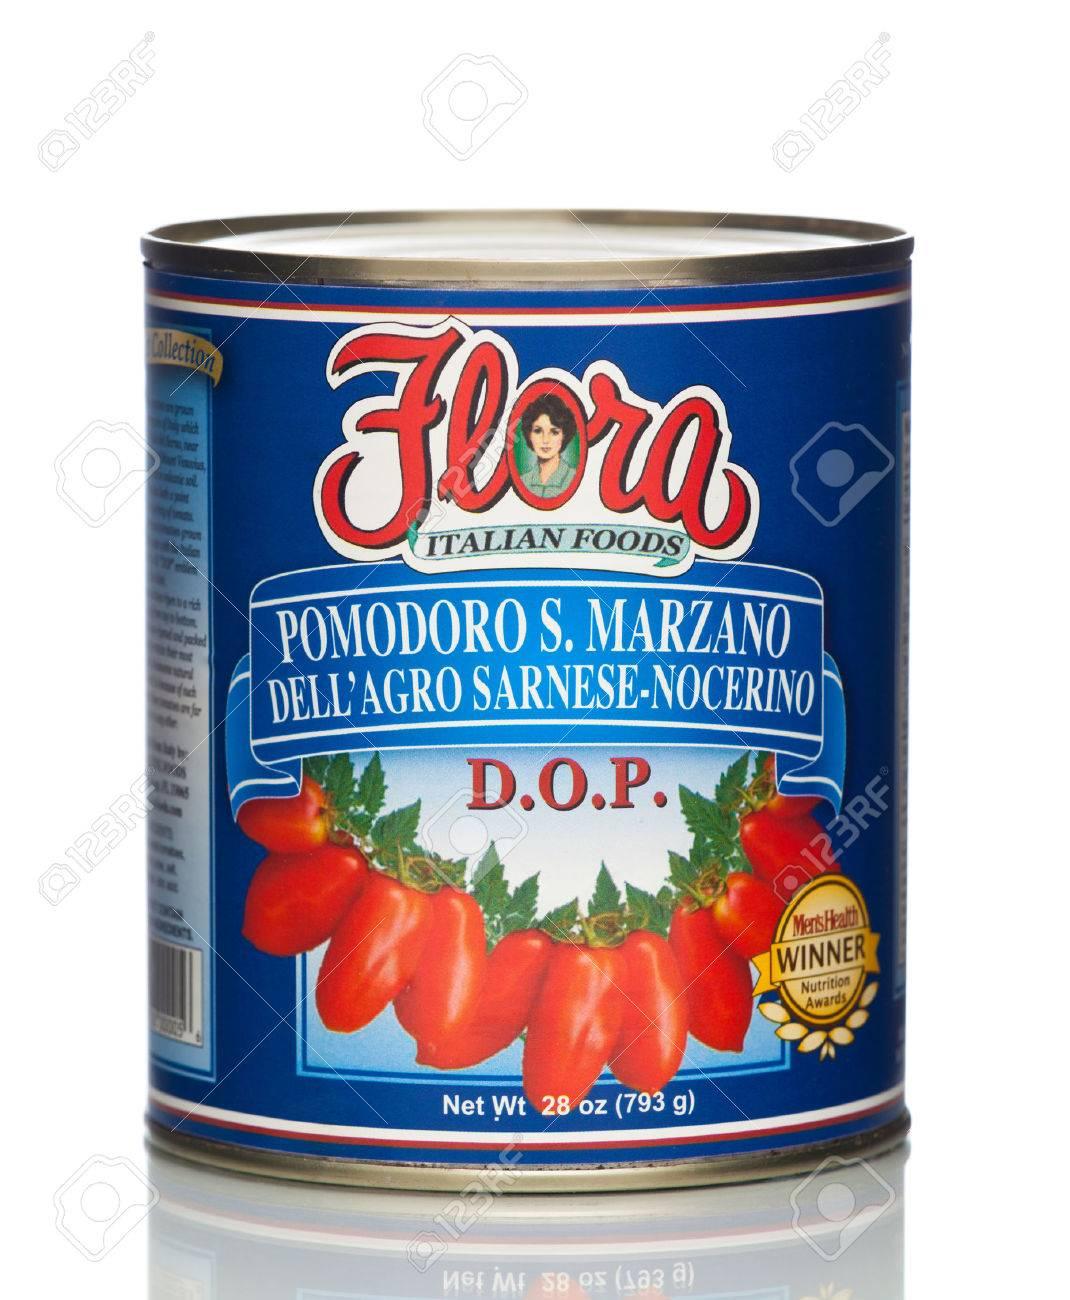 MIAMI, USA - JAN 26, 2015: 28 oz. Flora San Marzano Tomatoes. Authentic Italian Tomato. No cholesterol. This product contains lycopene, an antioxidant that promotes health. All natural. - 47830337